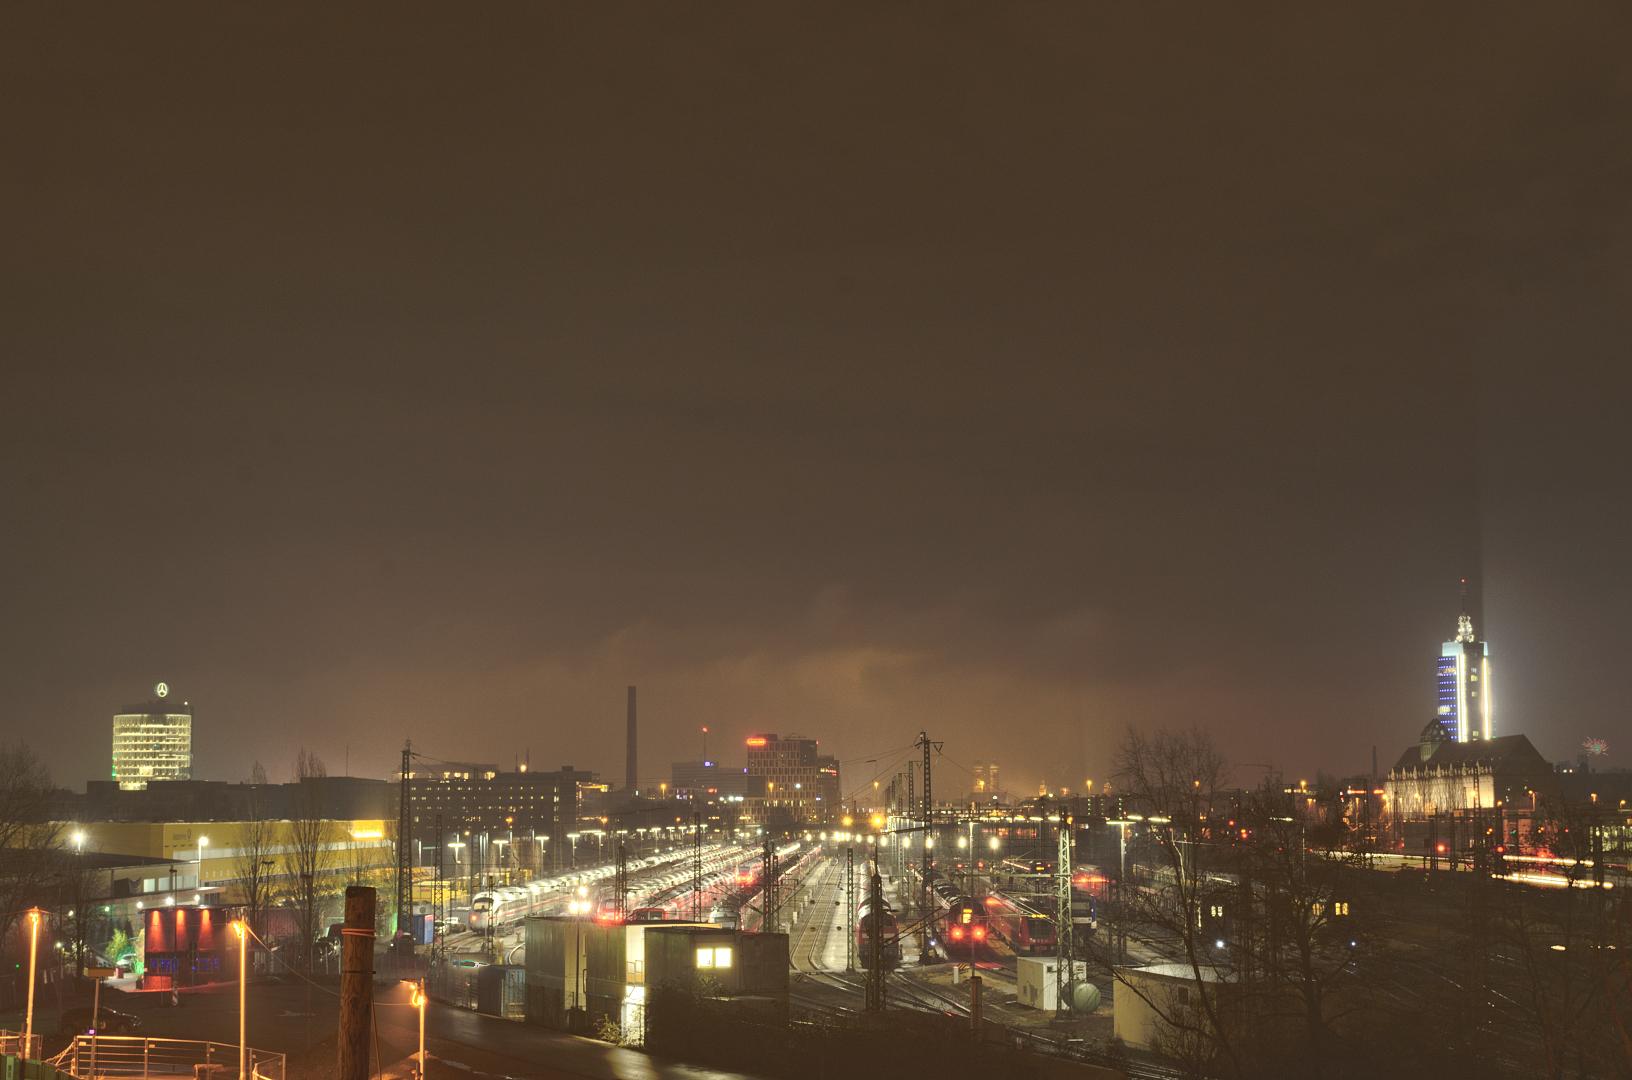 23:25 h